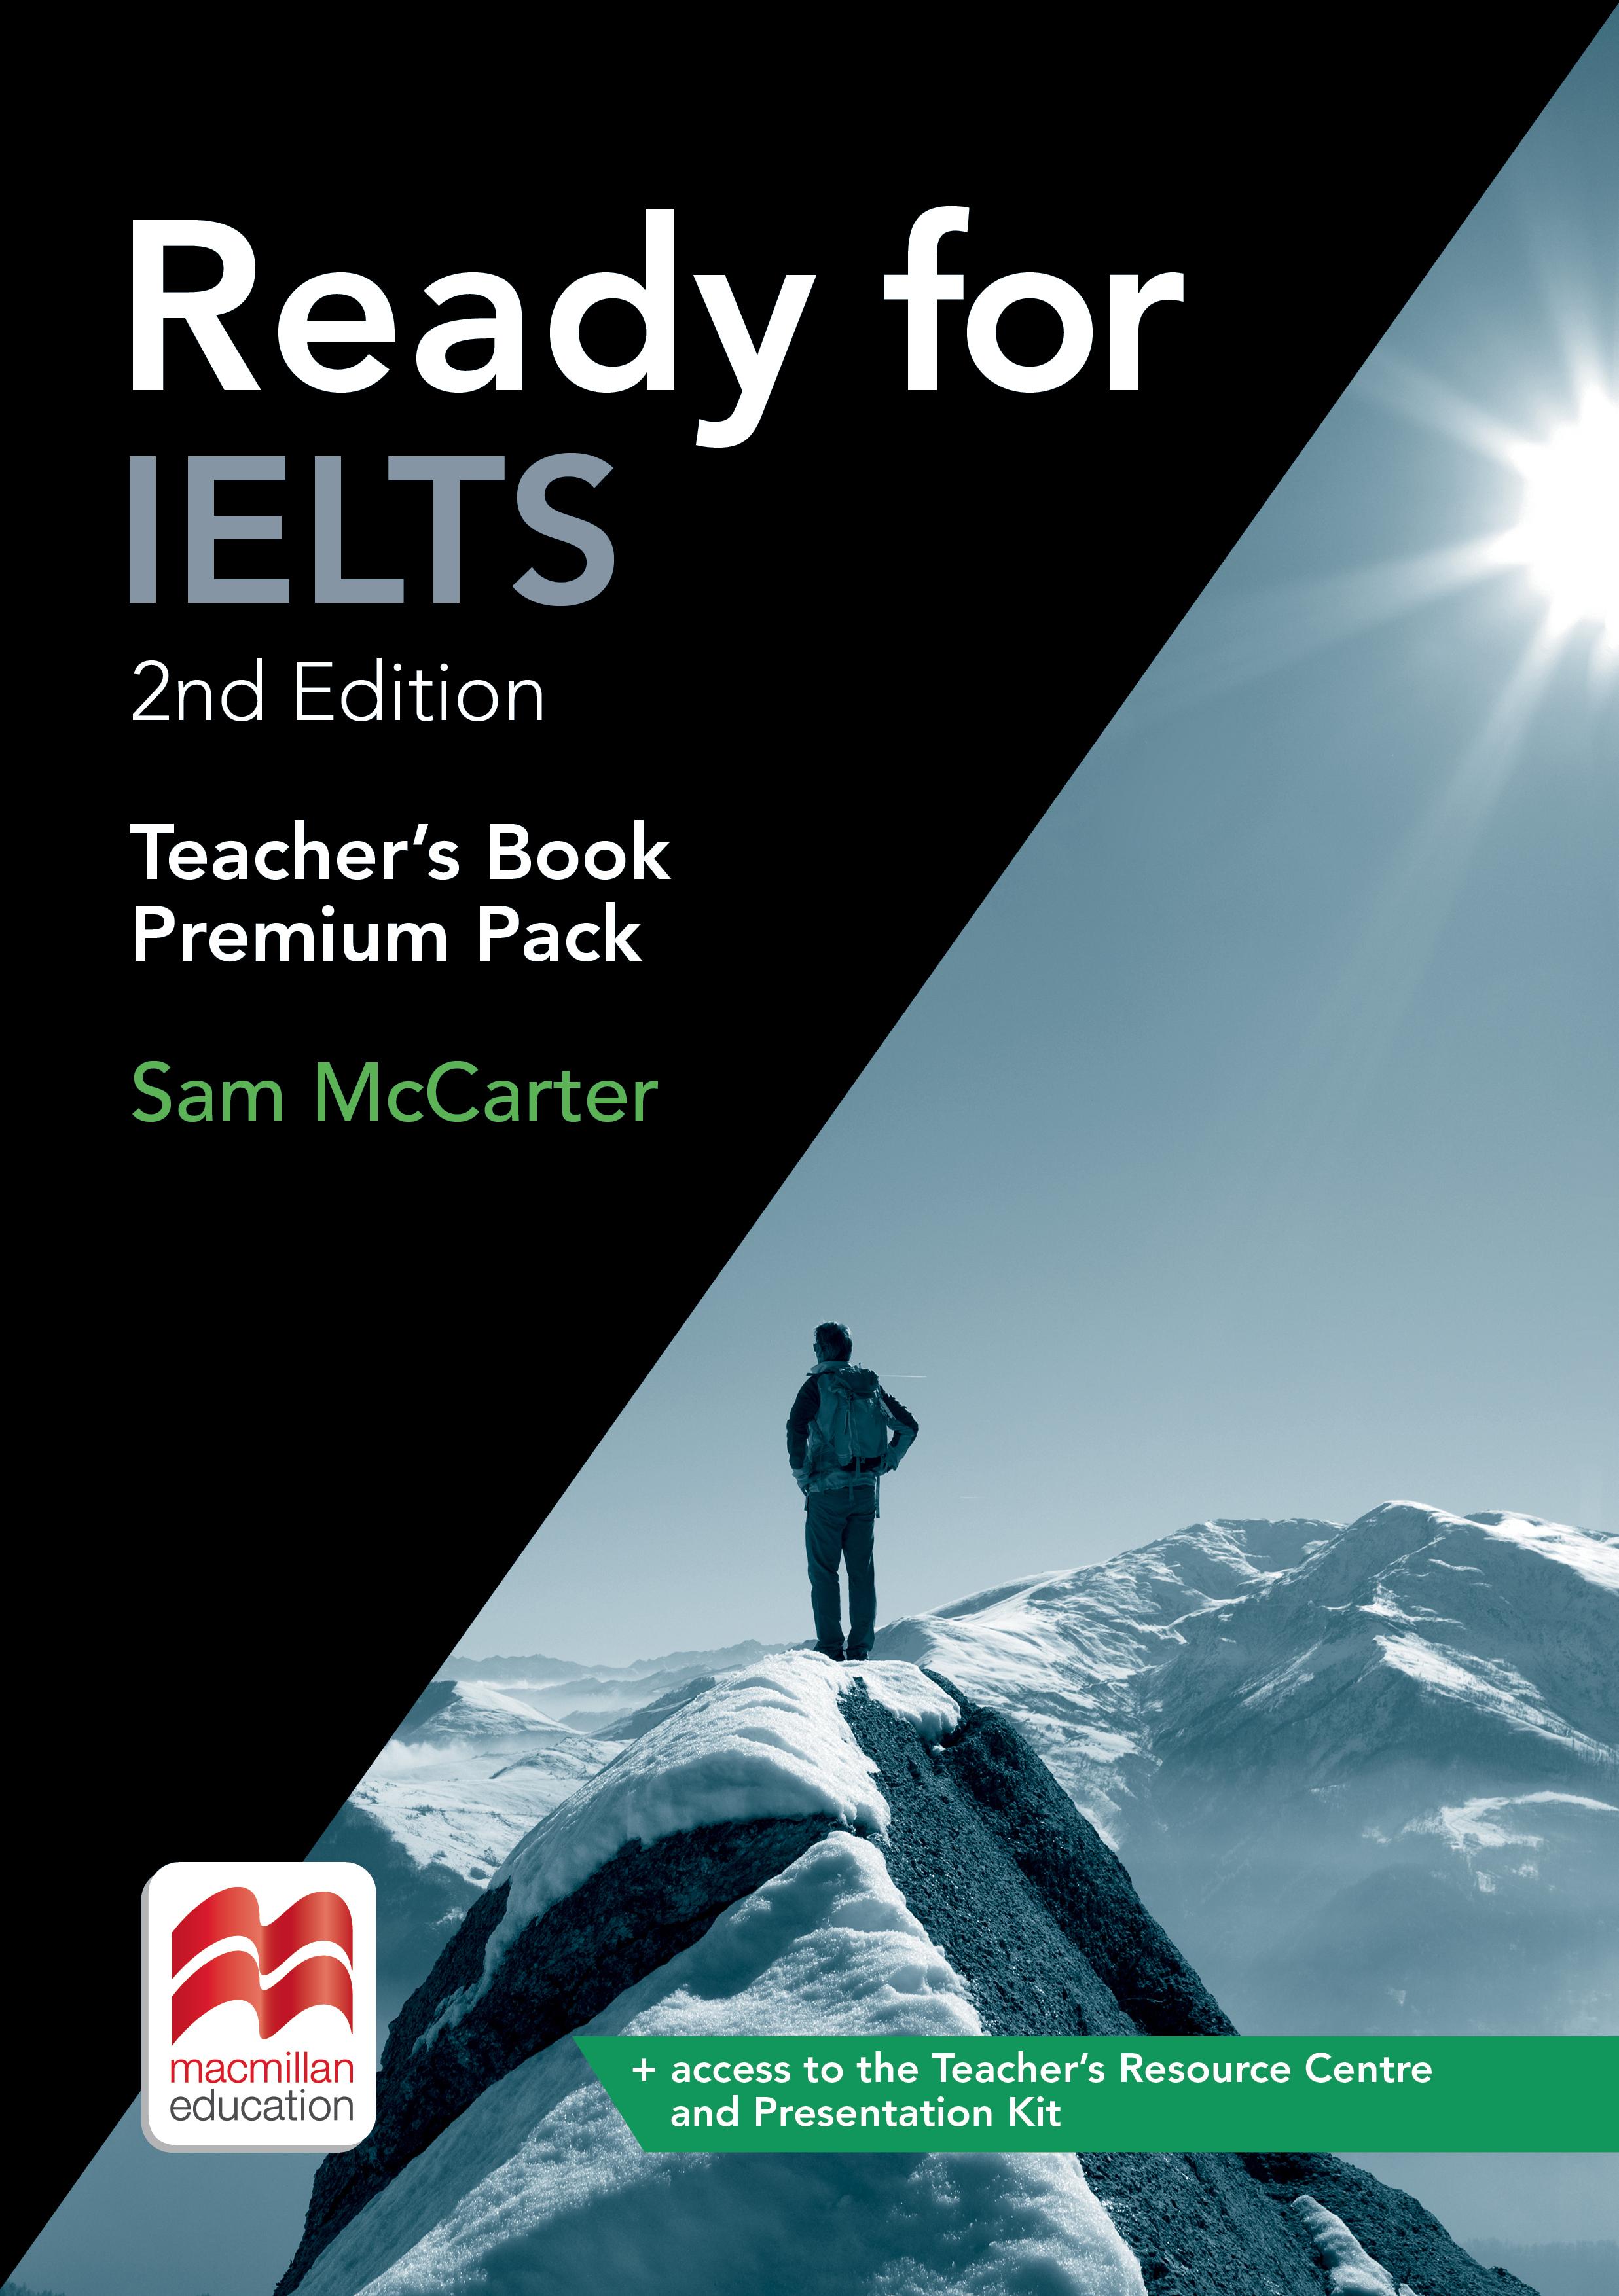 Ready for IELTS 2nd Edition Teacher